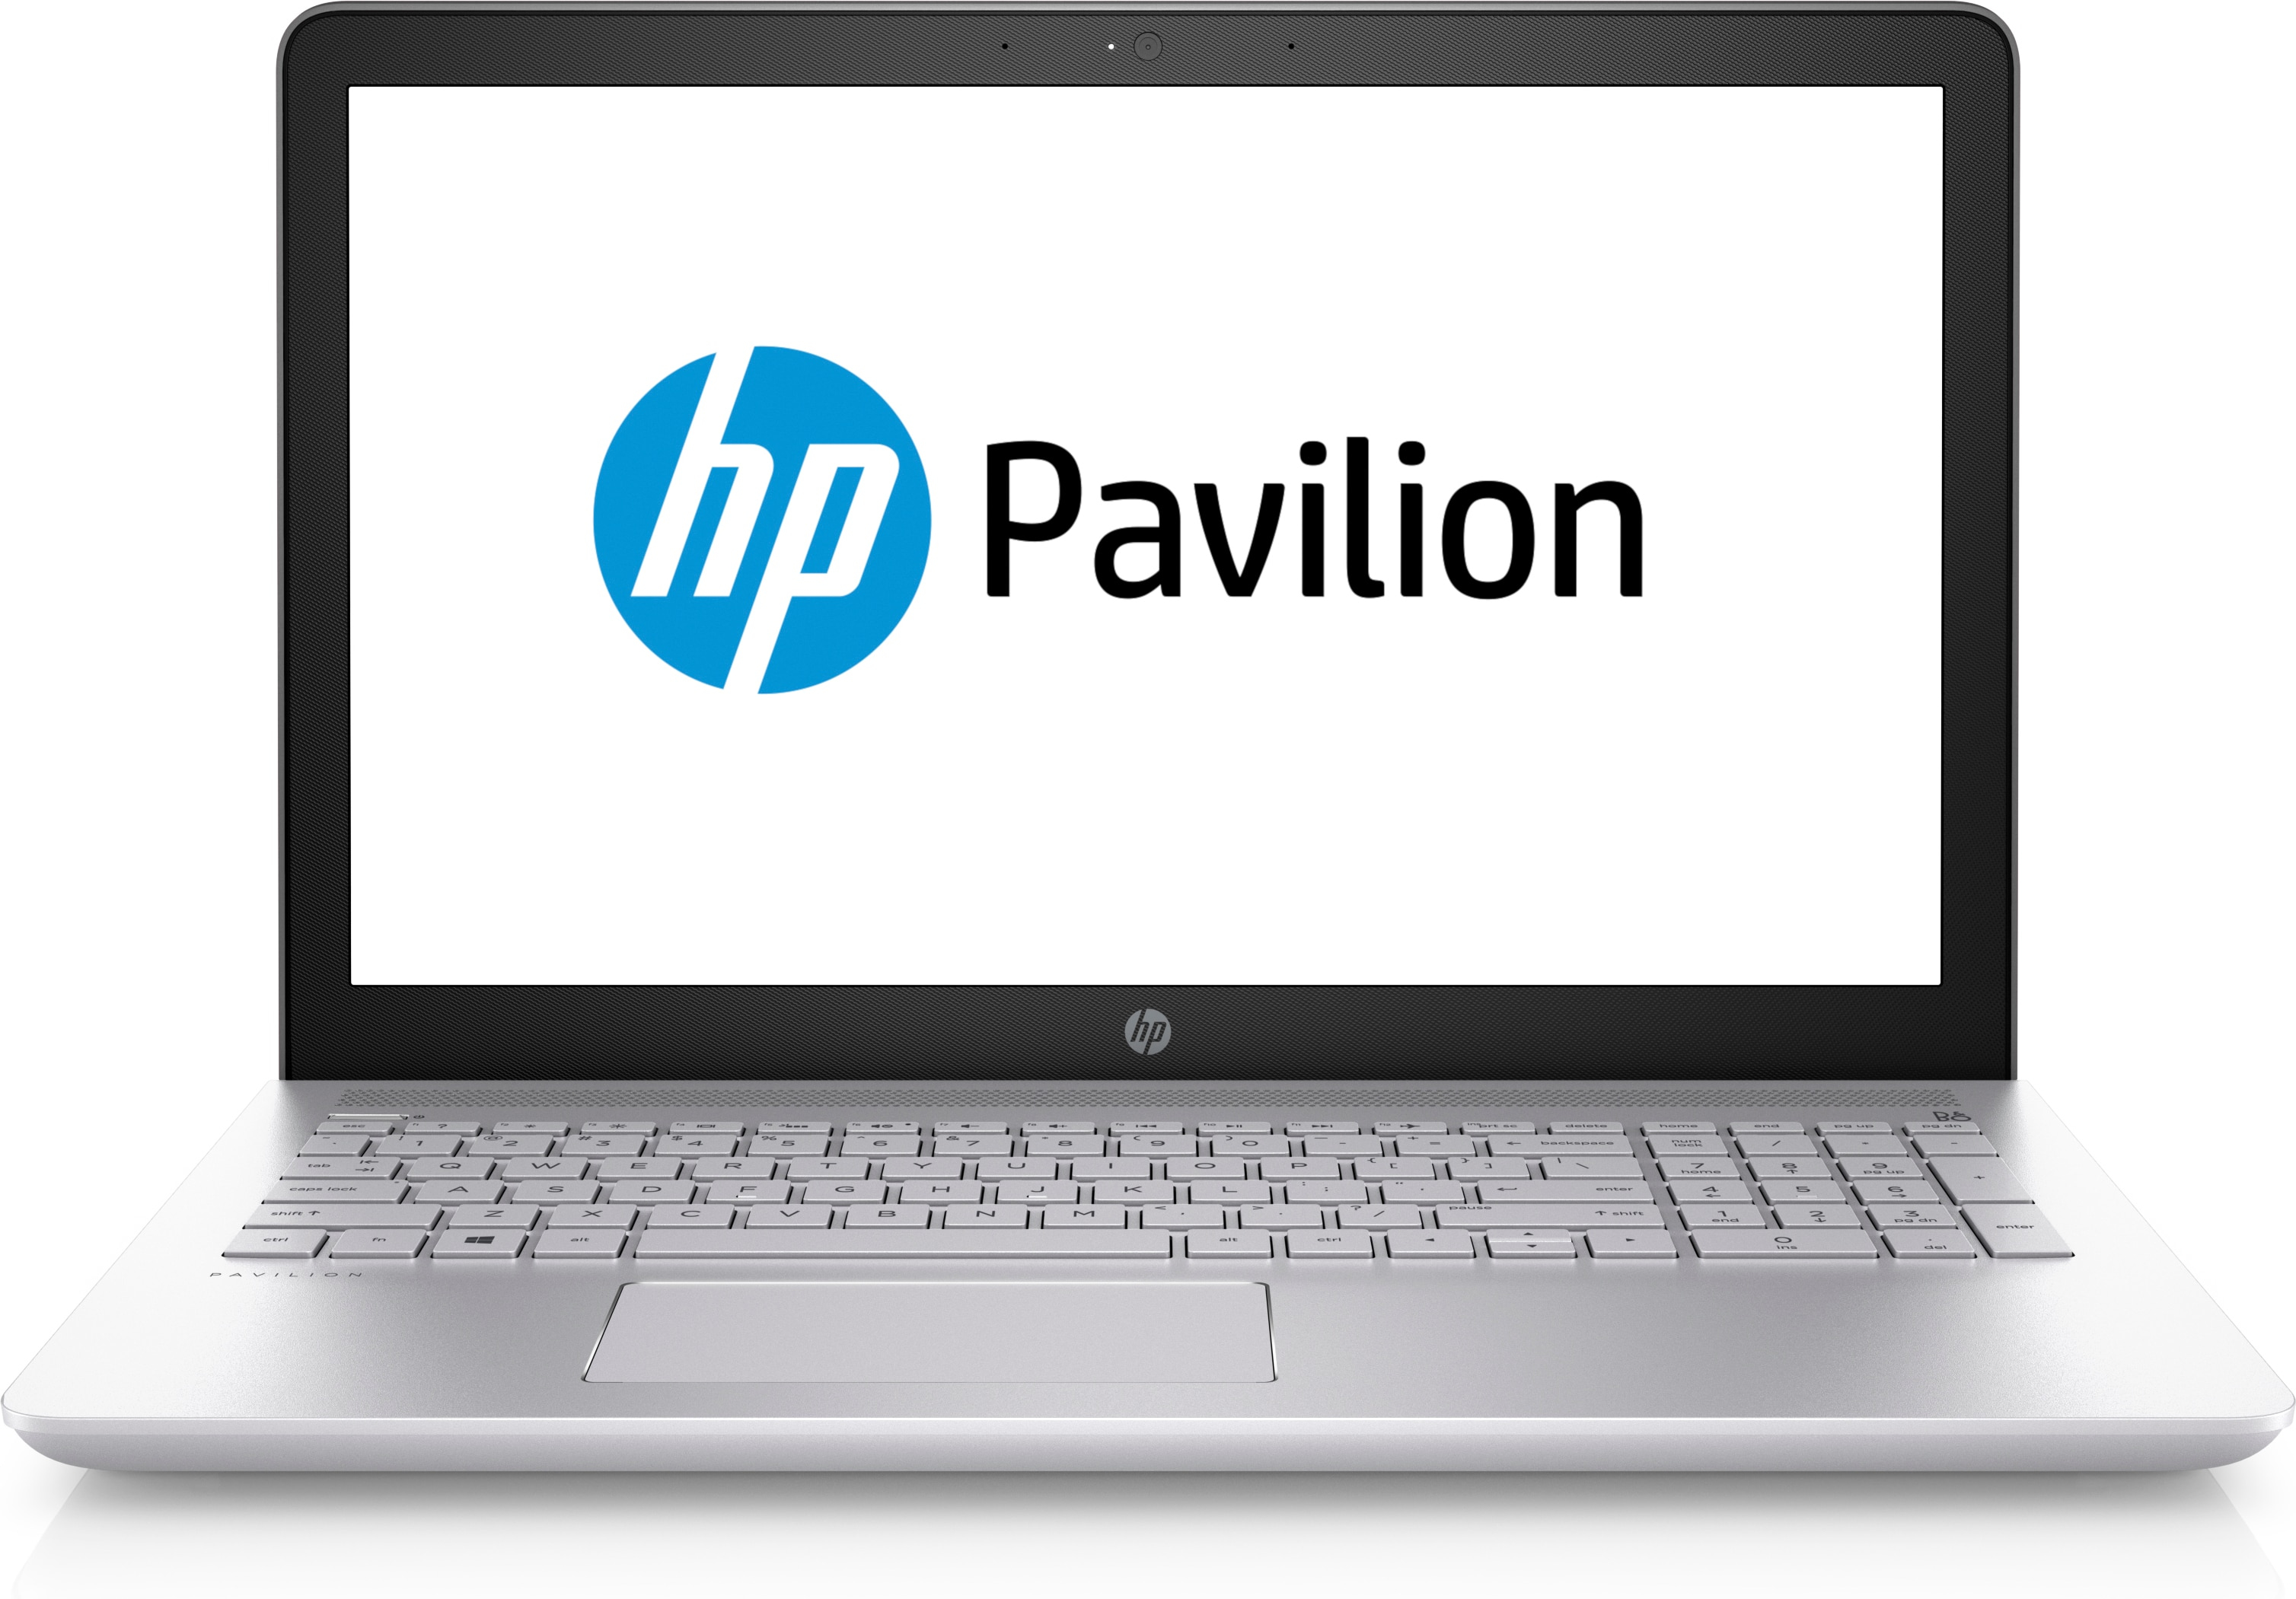 Hewlett Packard HP HP Pavilion 15 cc017ng Notebook i5 8GB 256GB SSD